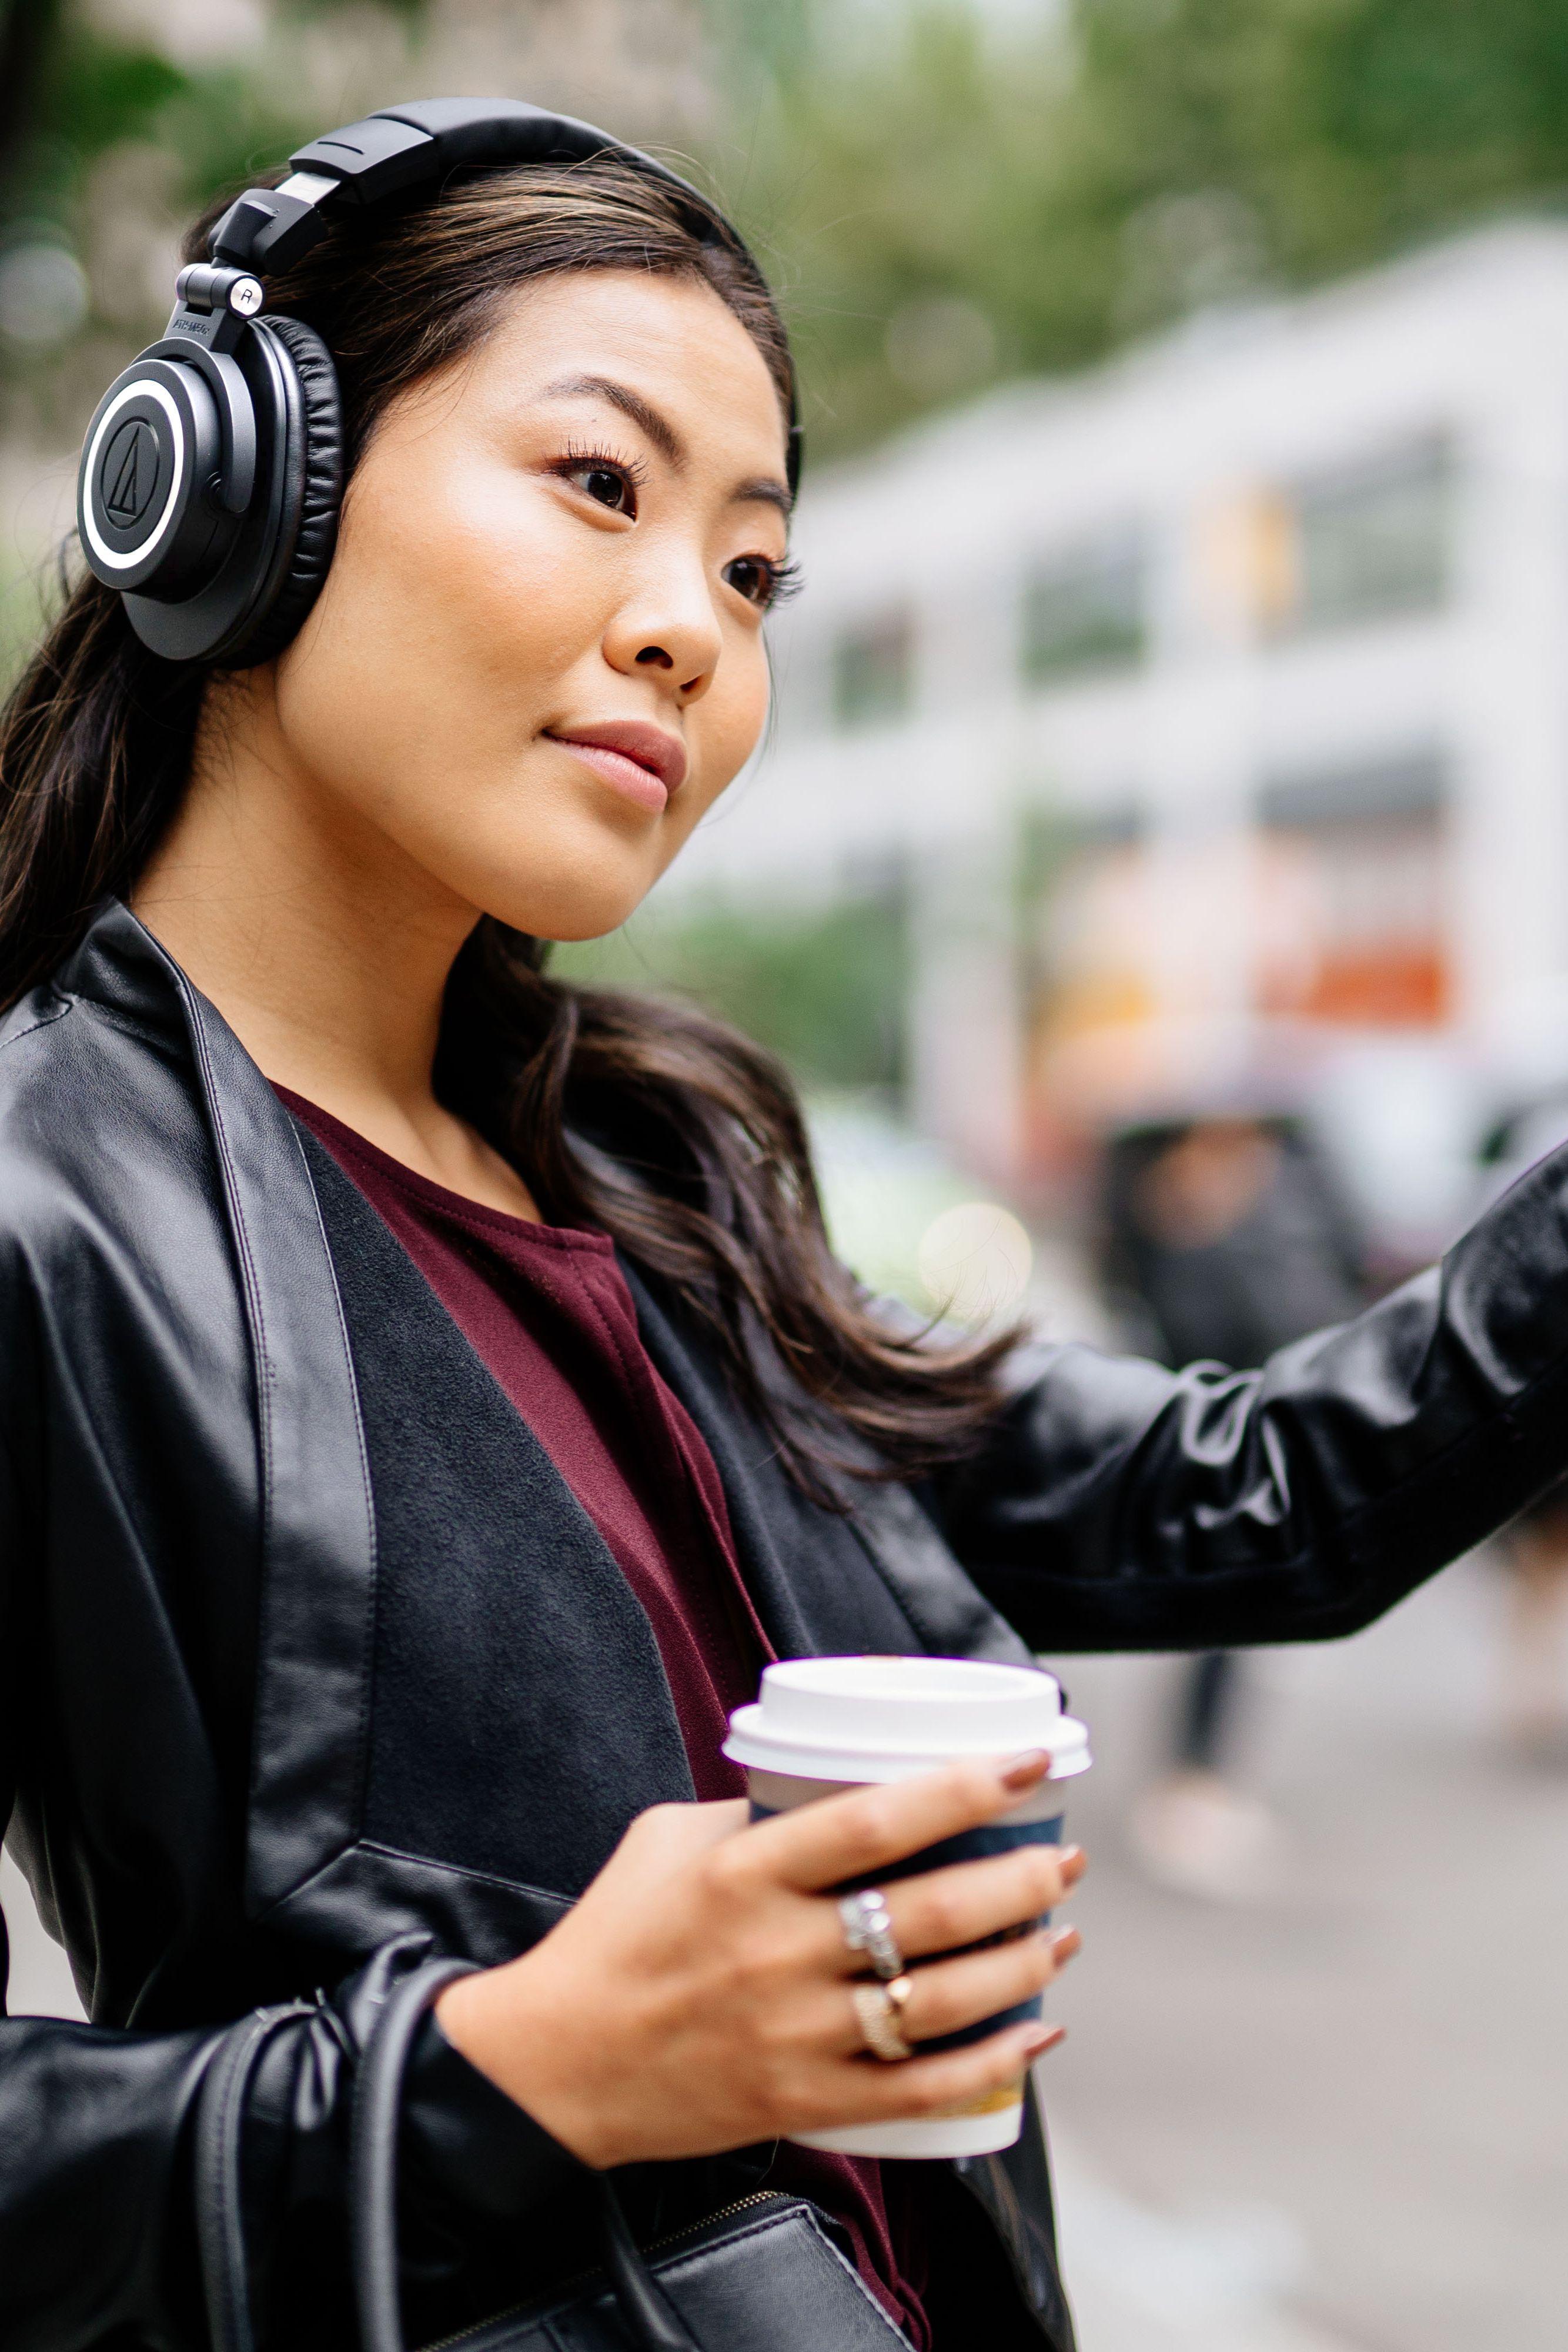 57 Ath M50x Headphone Fans Ideas Audio Technica Headphone Ath